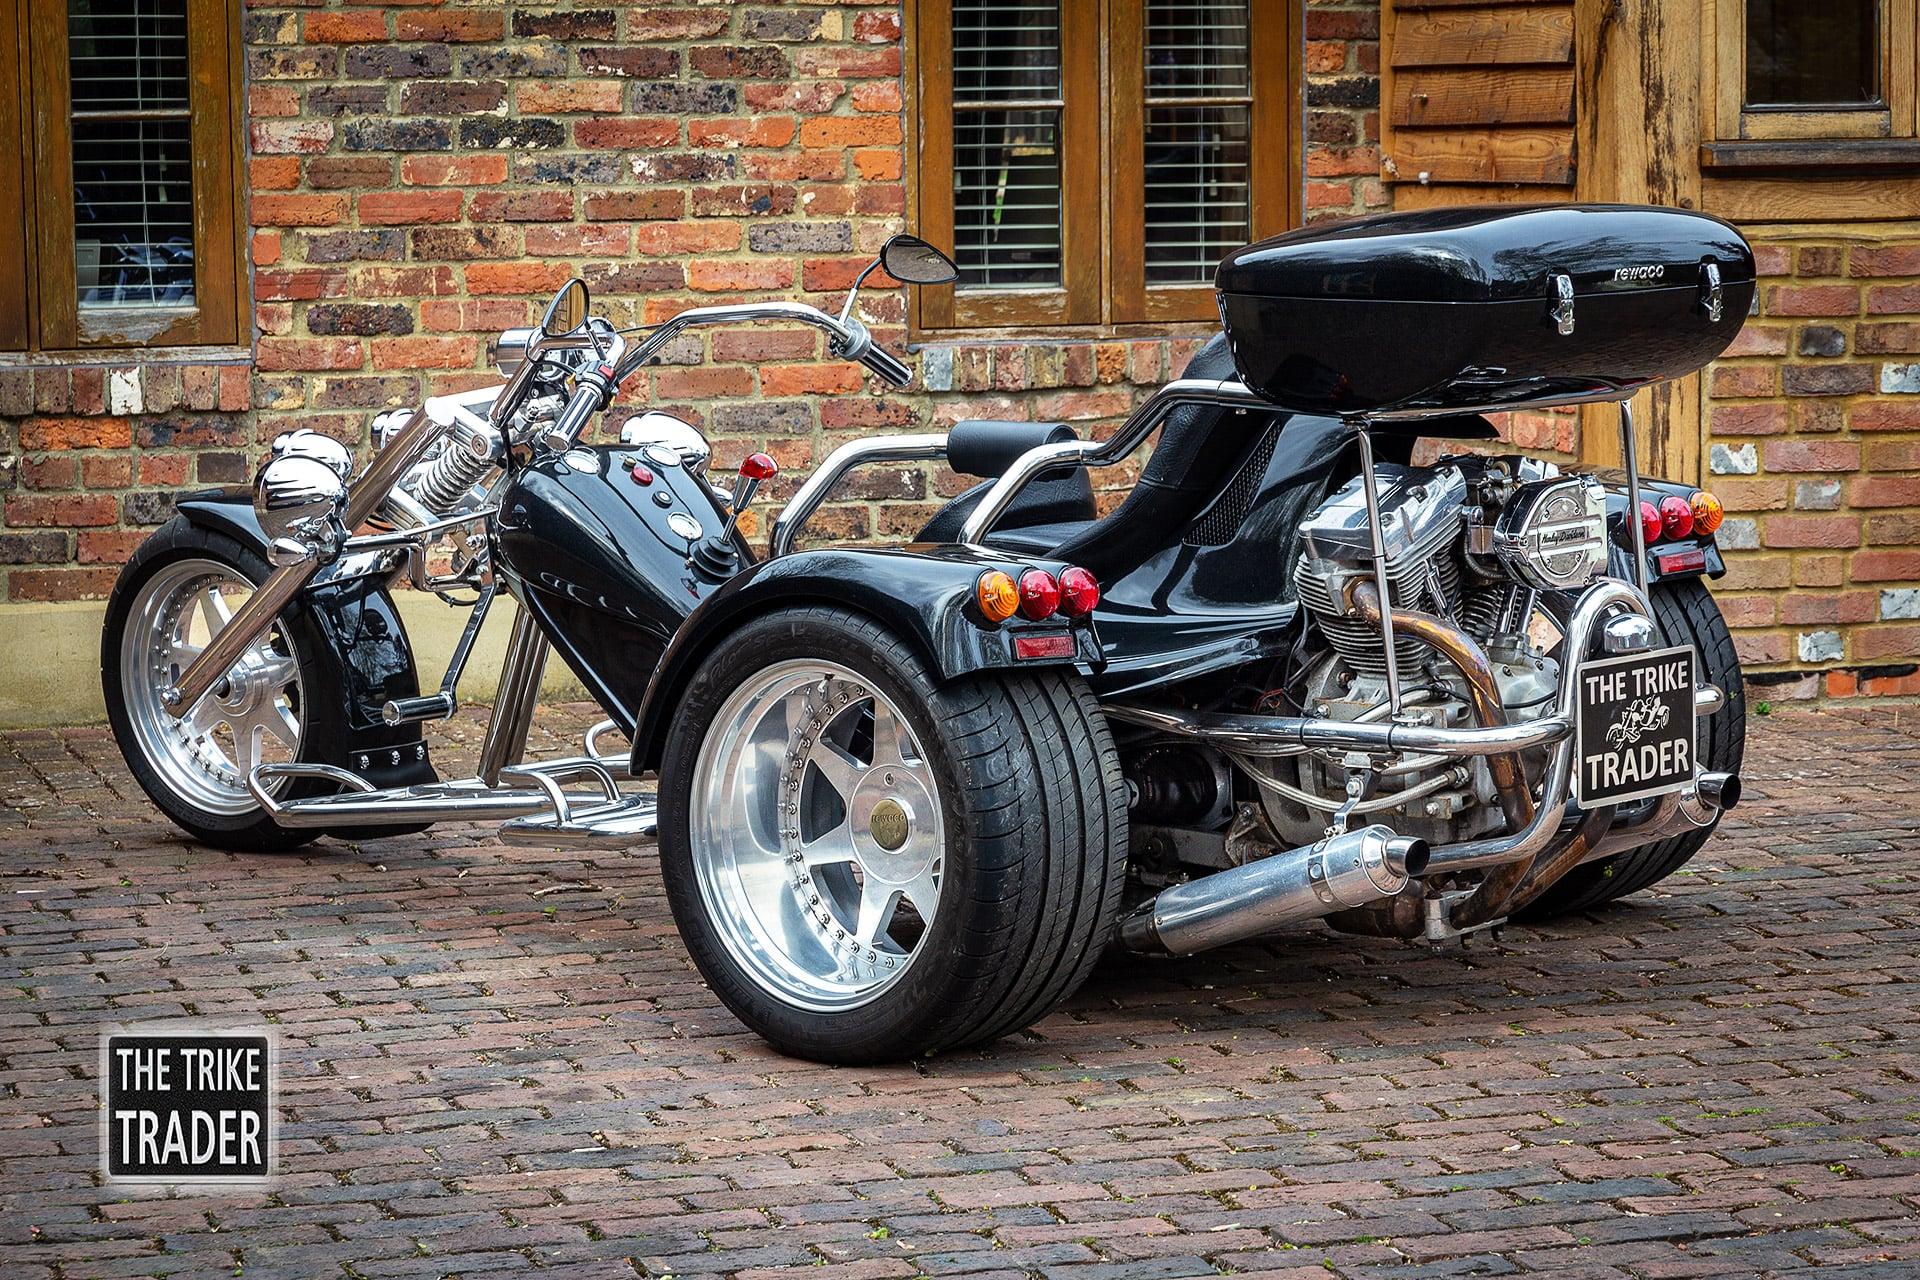 Rewaco Trike HS6 HD V-Twin 2005